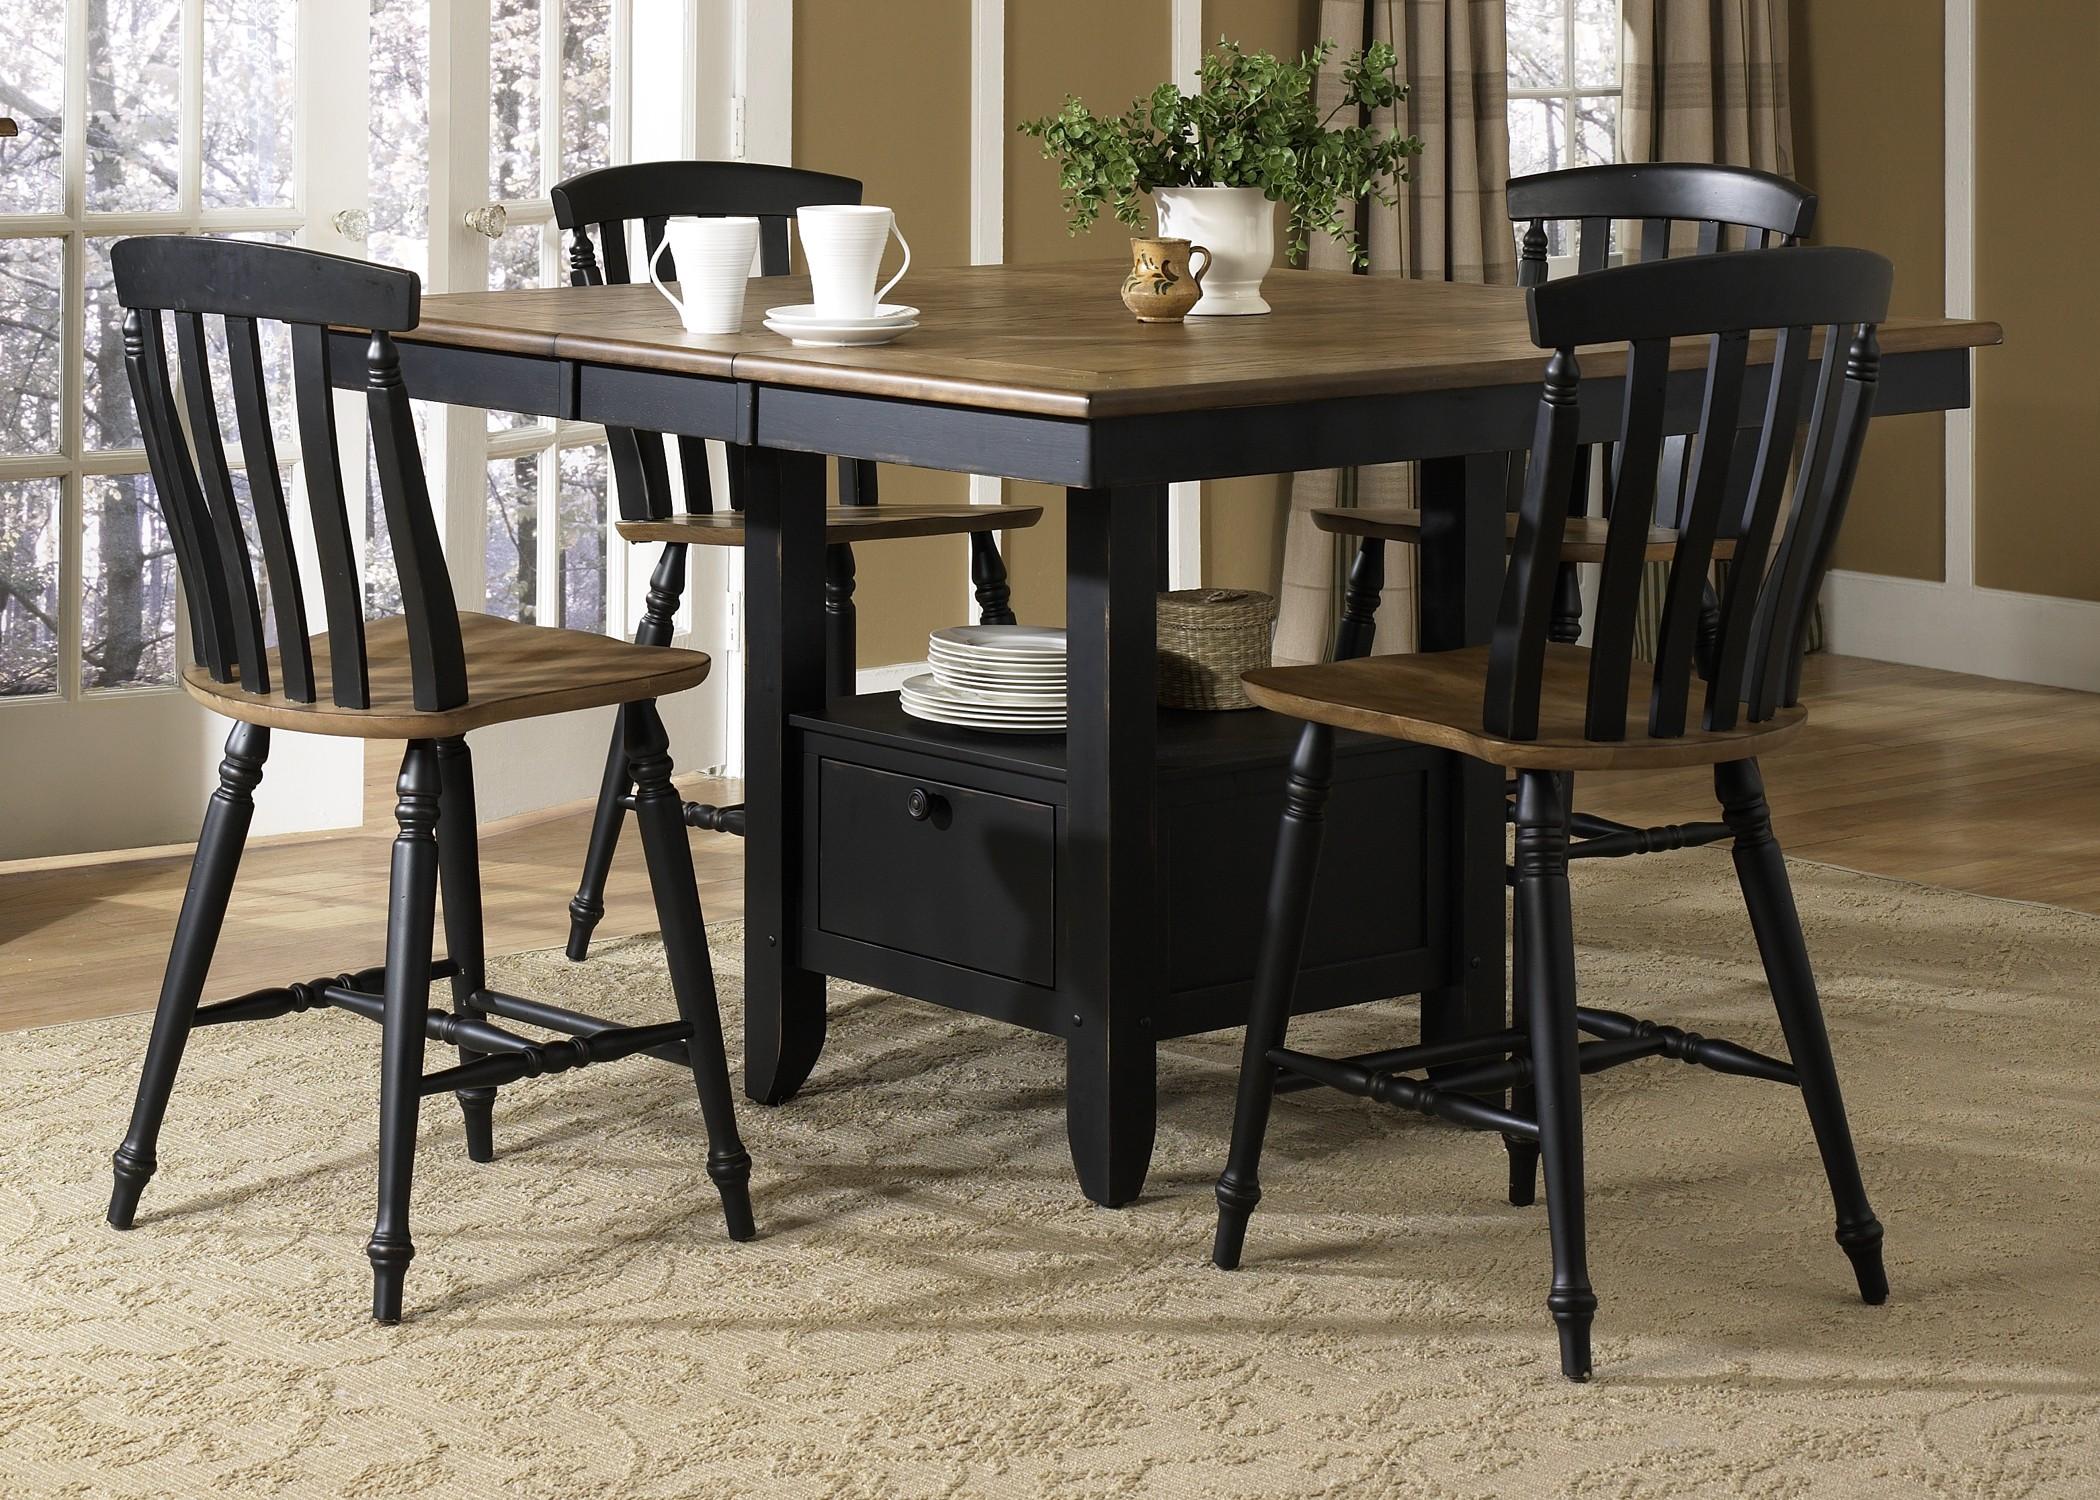 Al Fresco Black Gathering Table Dining Room Set from